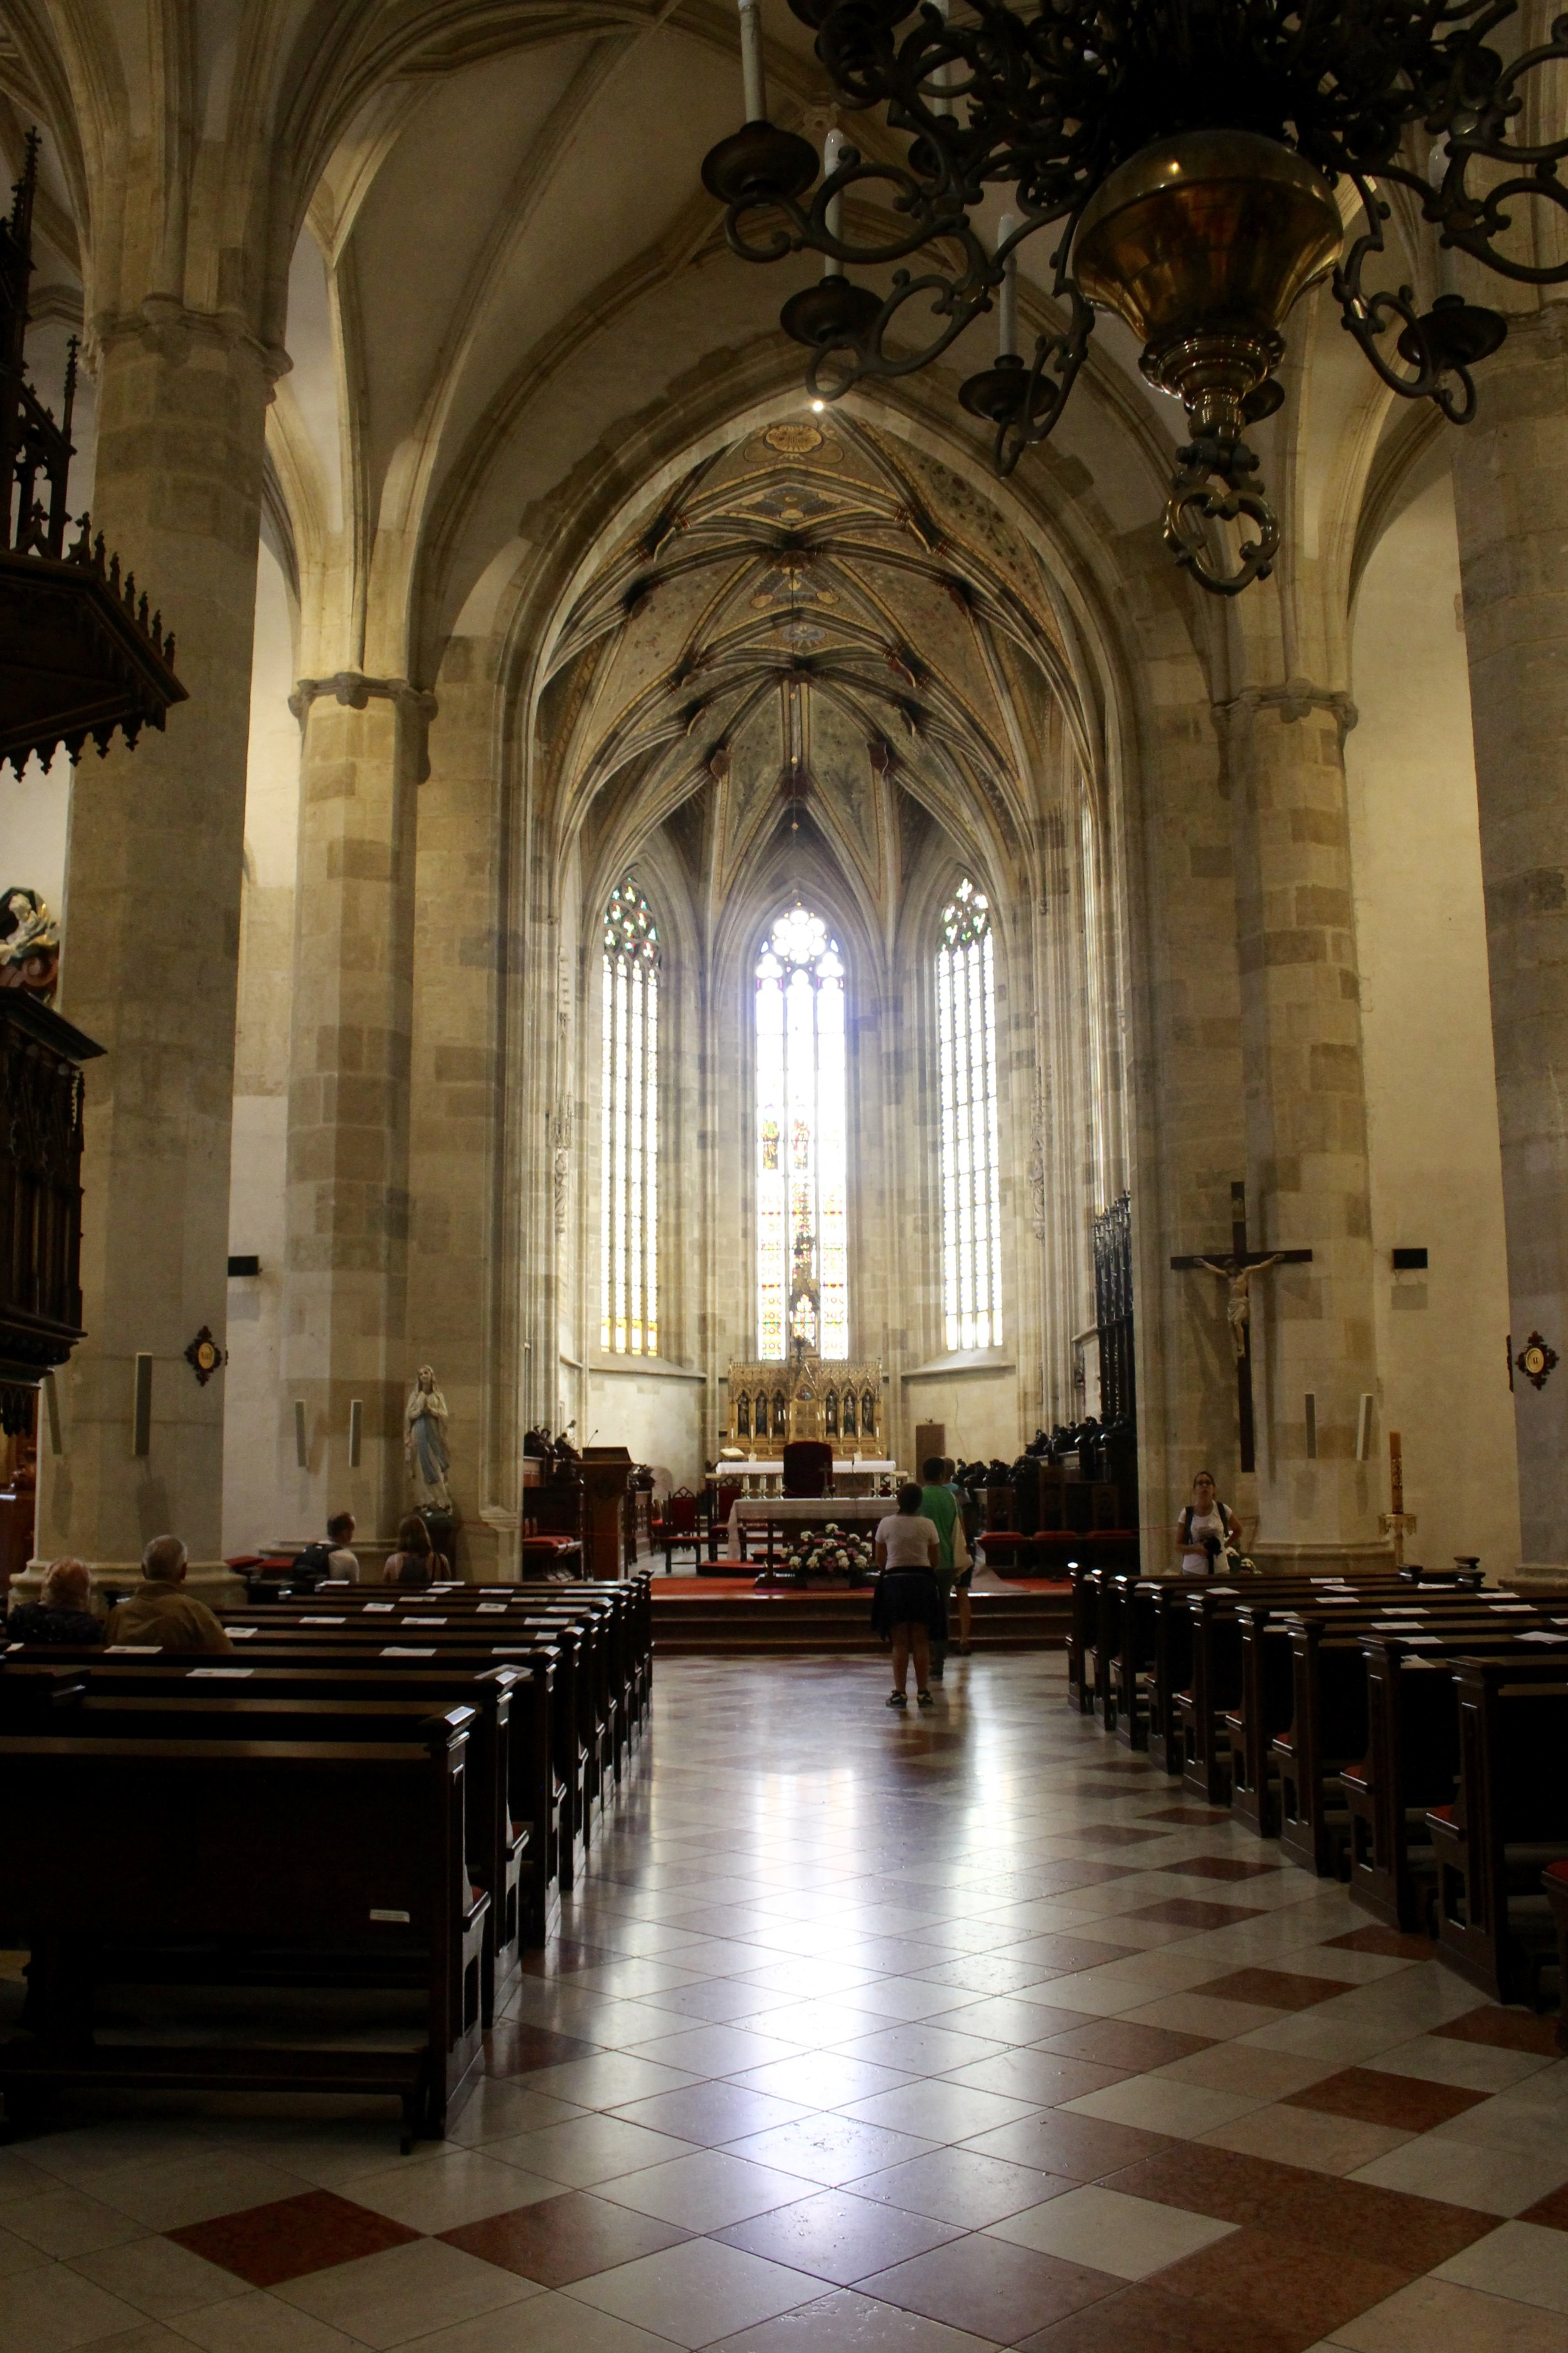 St. Martin's Cathedral (Bratislava, Slovakia)